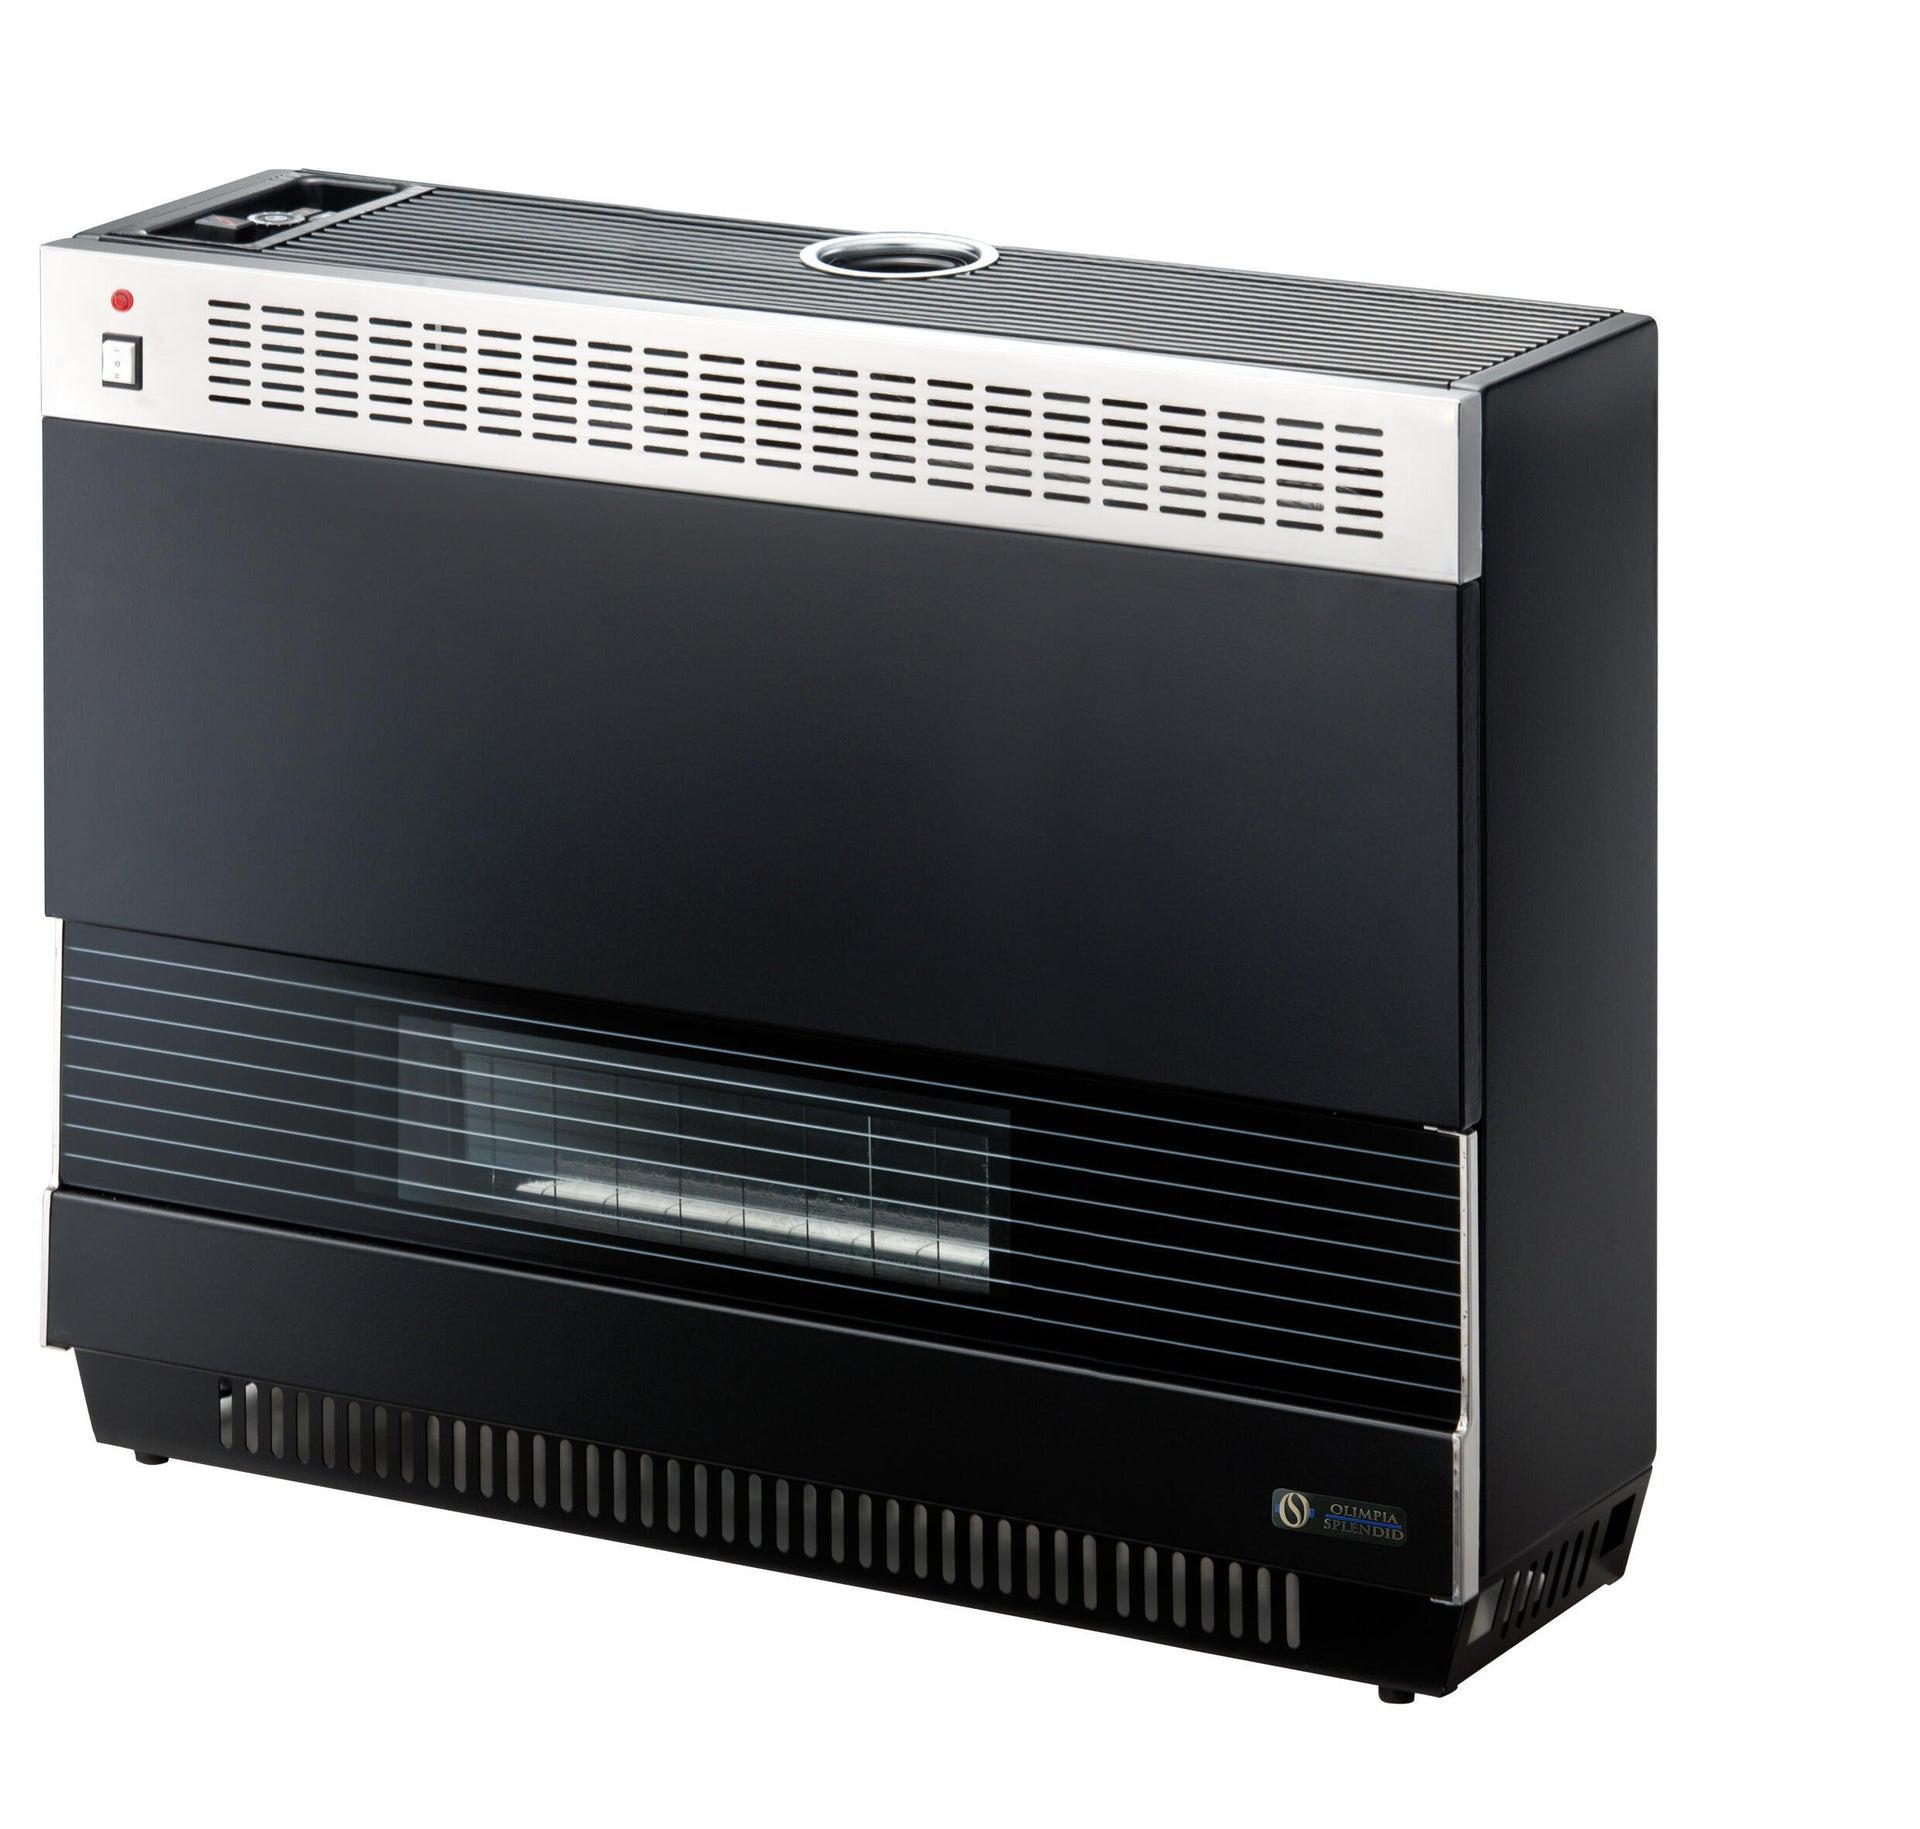 Stufa catalitica OLIMPIA SPLENDID SG 125 TURBO HE 9 kW